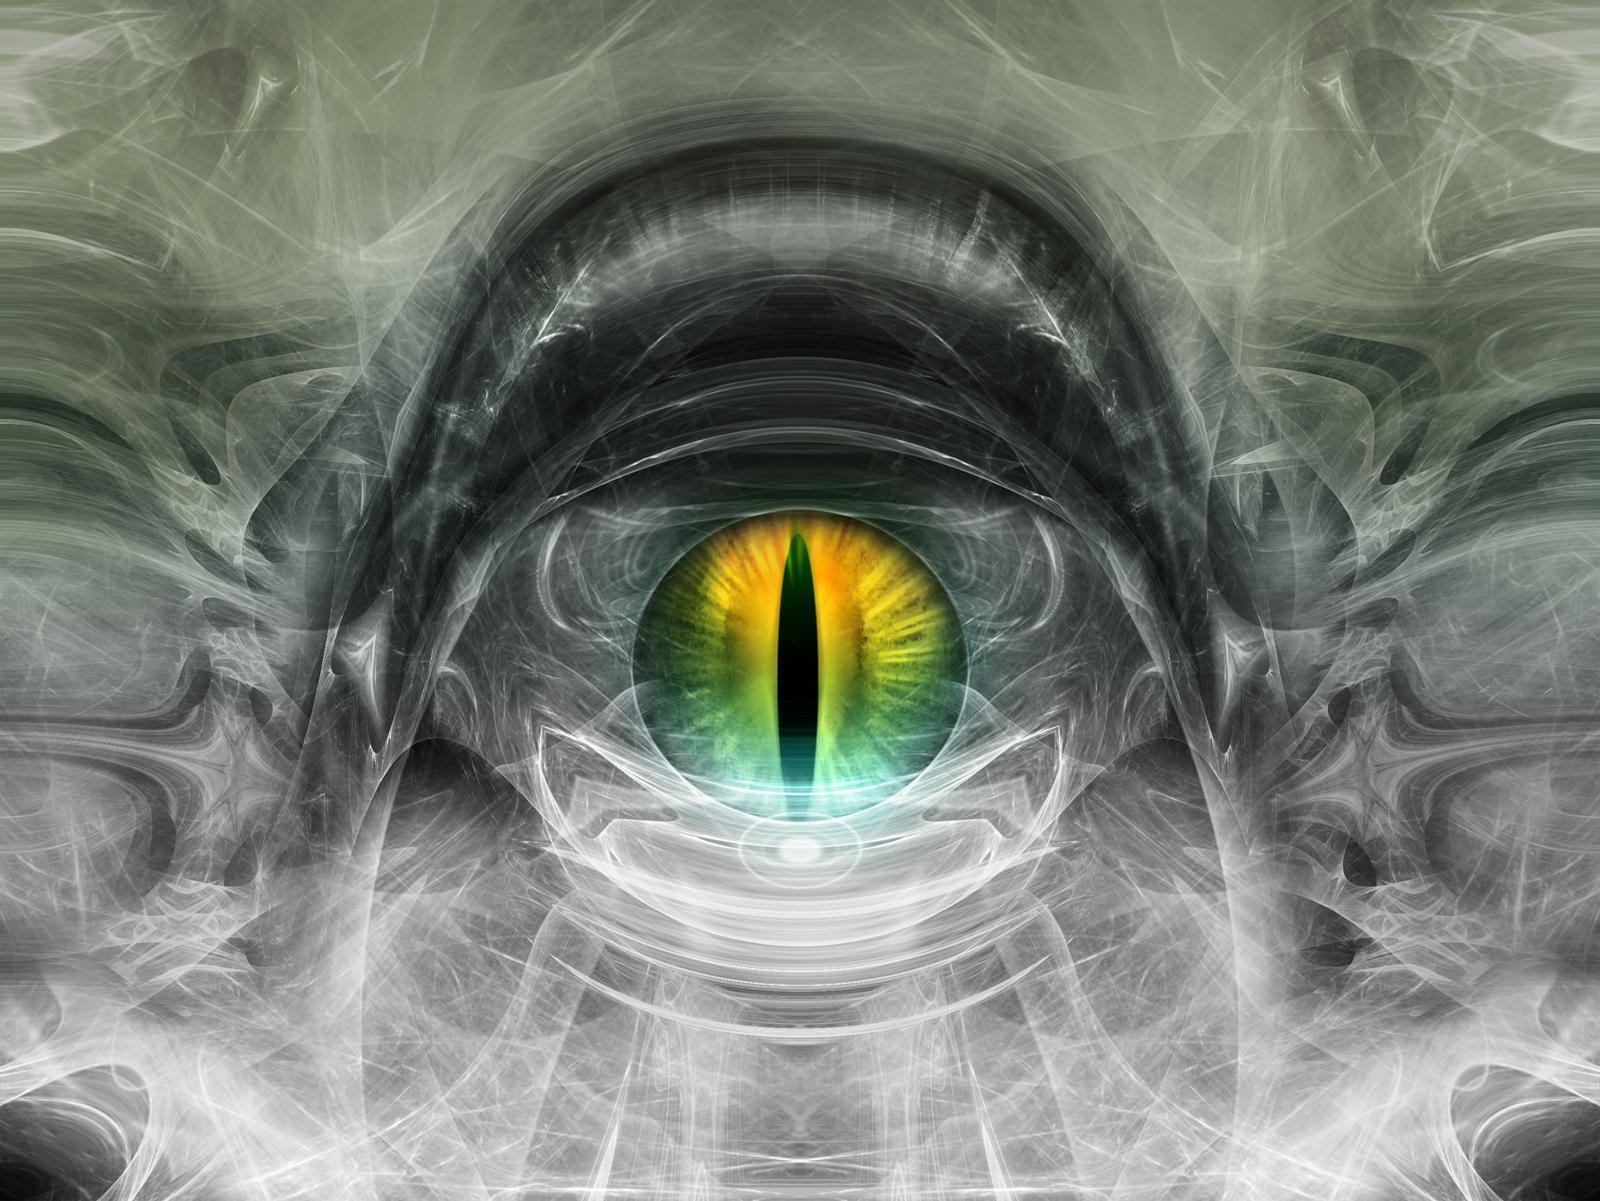 planeta oculto wallpaper - photo #13